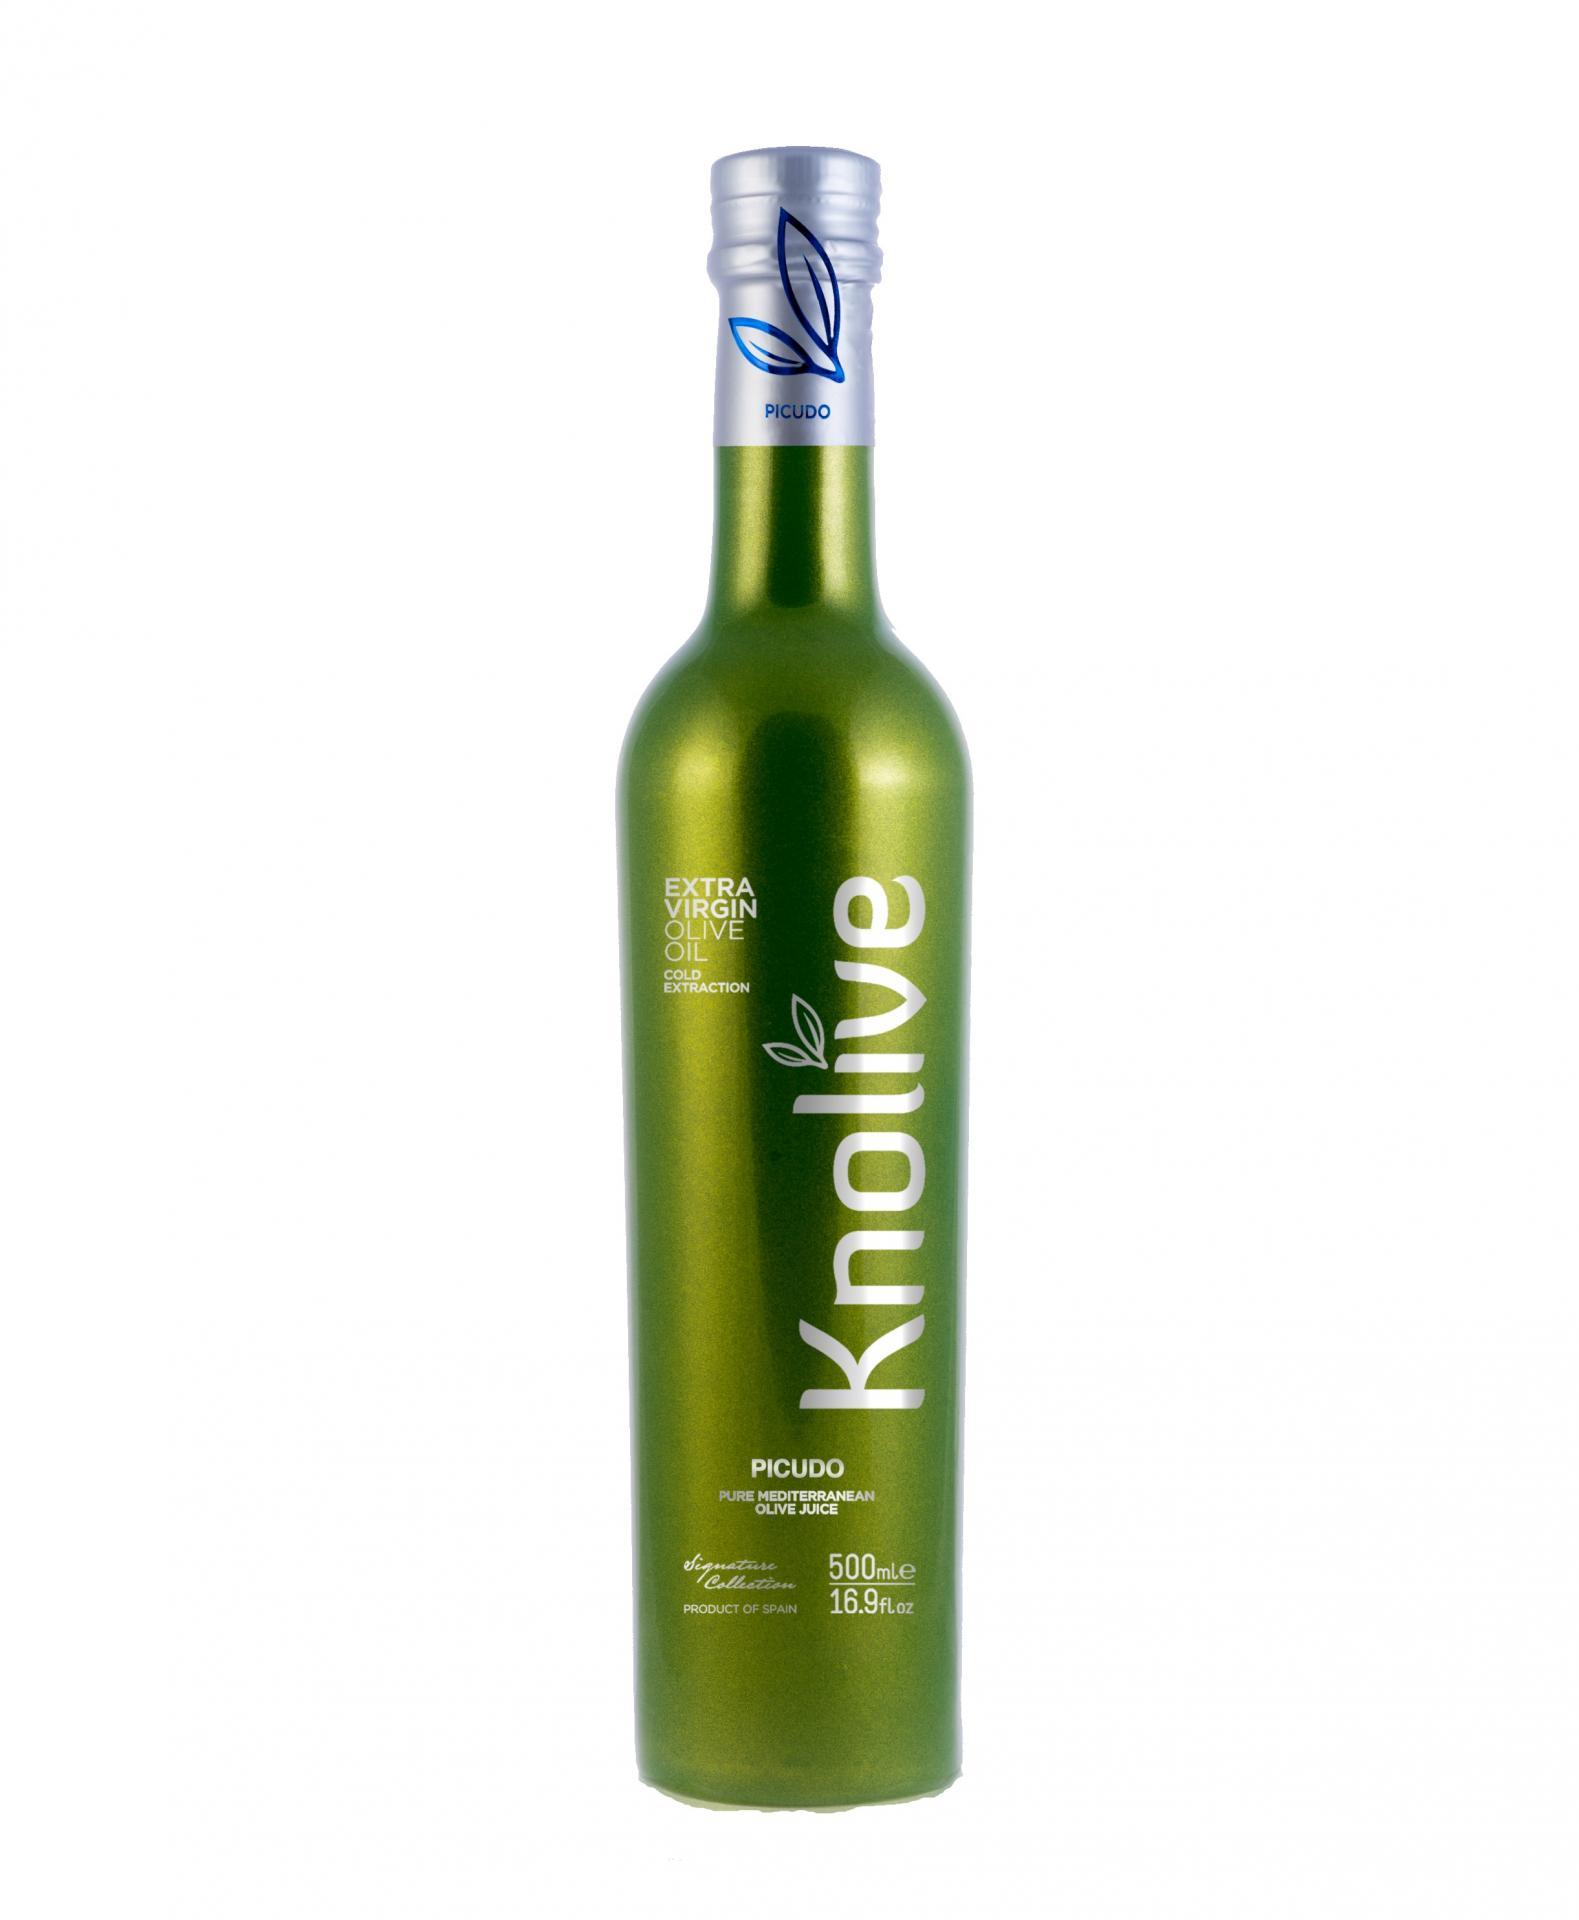 Knolive Picudo Aceite Oliva